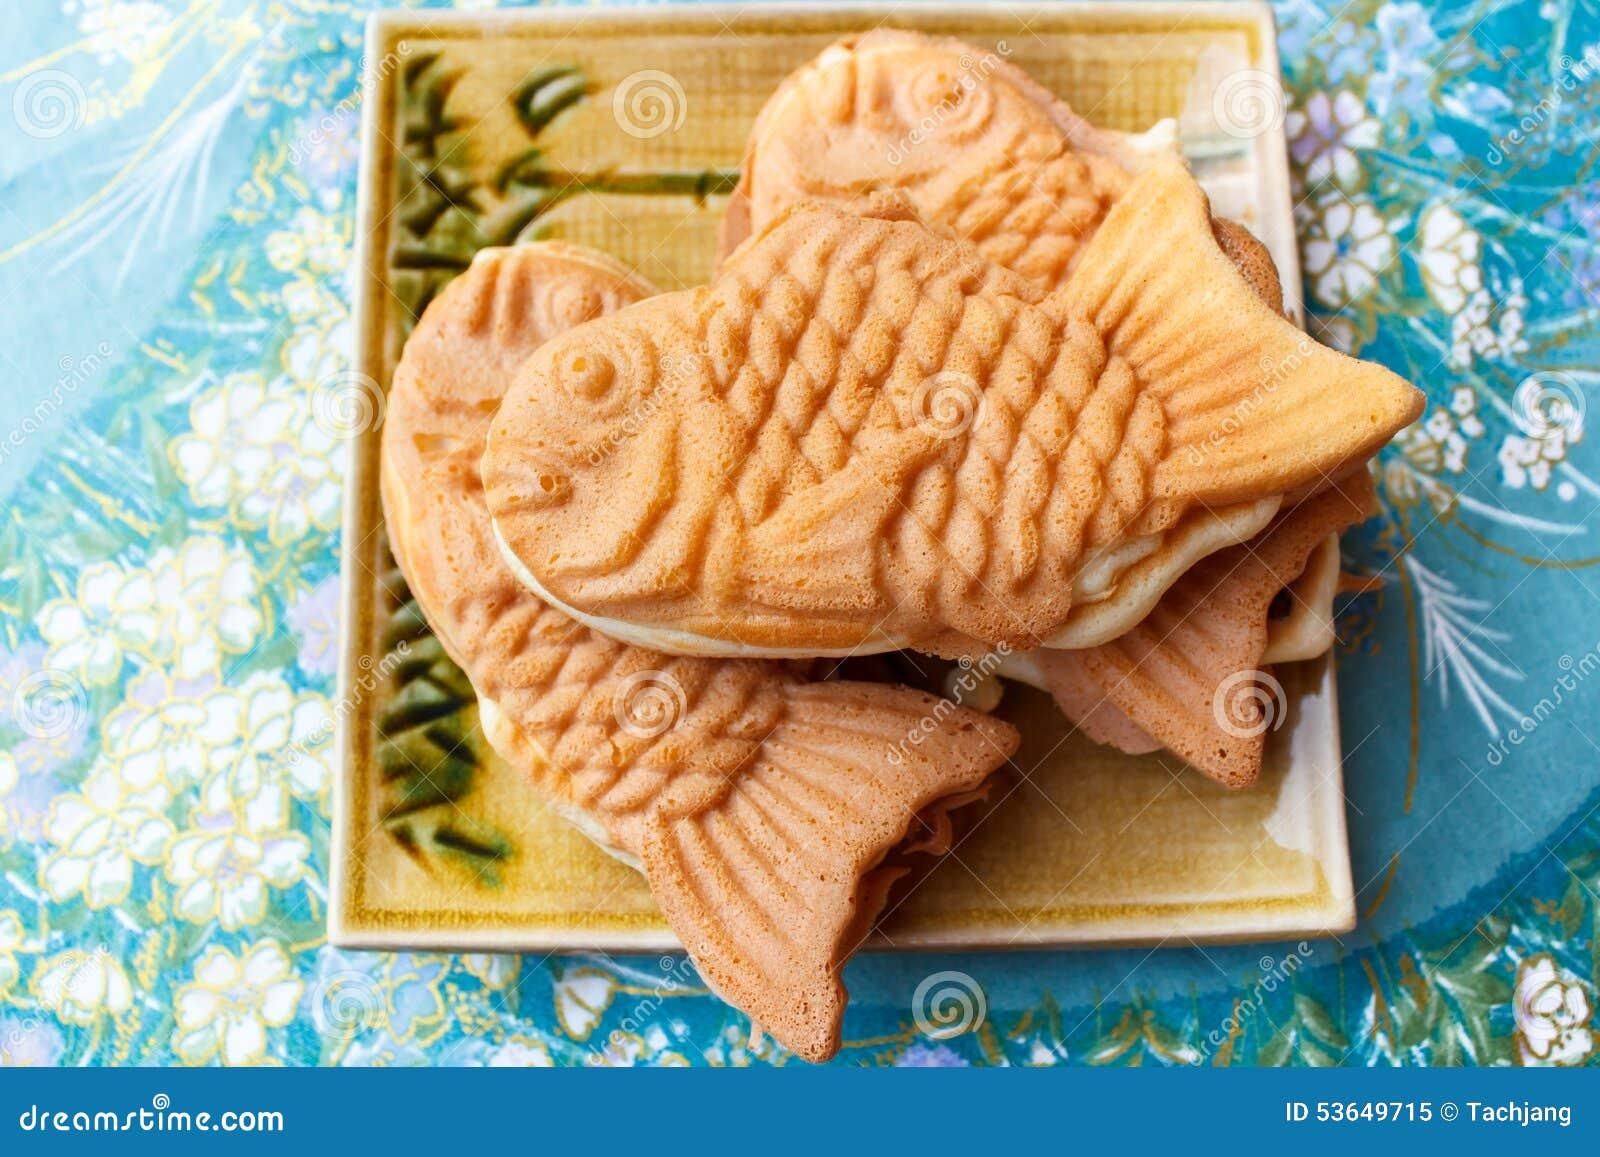 Japanese Traditional Fishshaped Cake Taiyaki Stock Photo